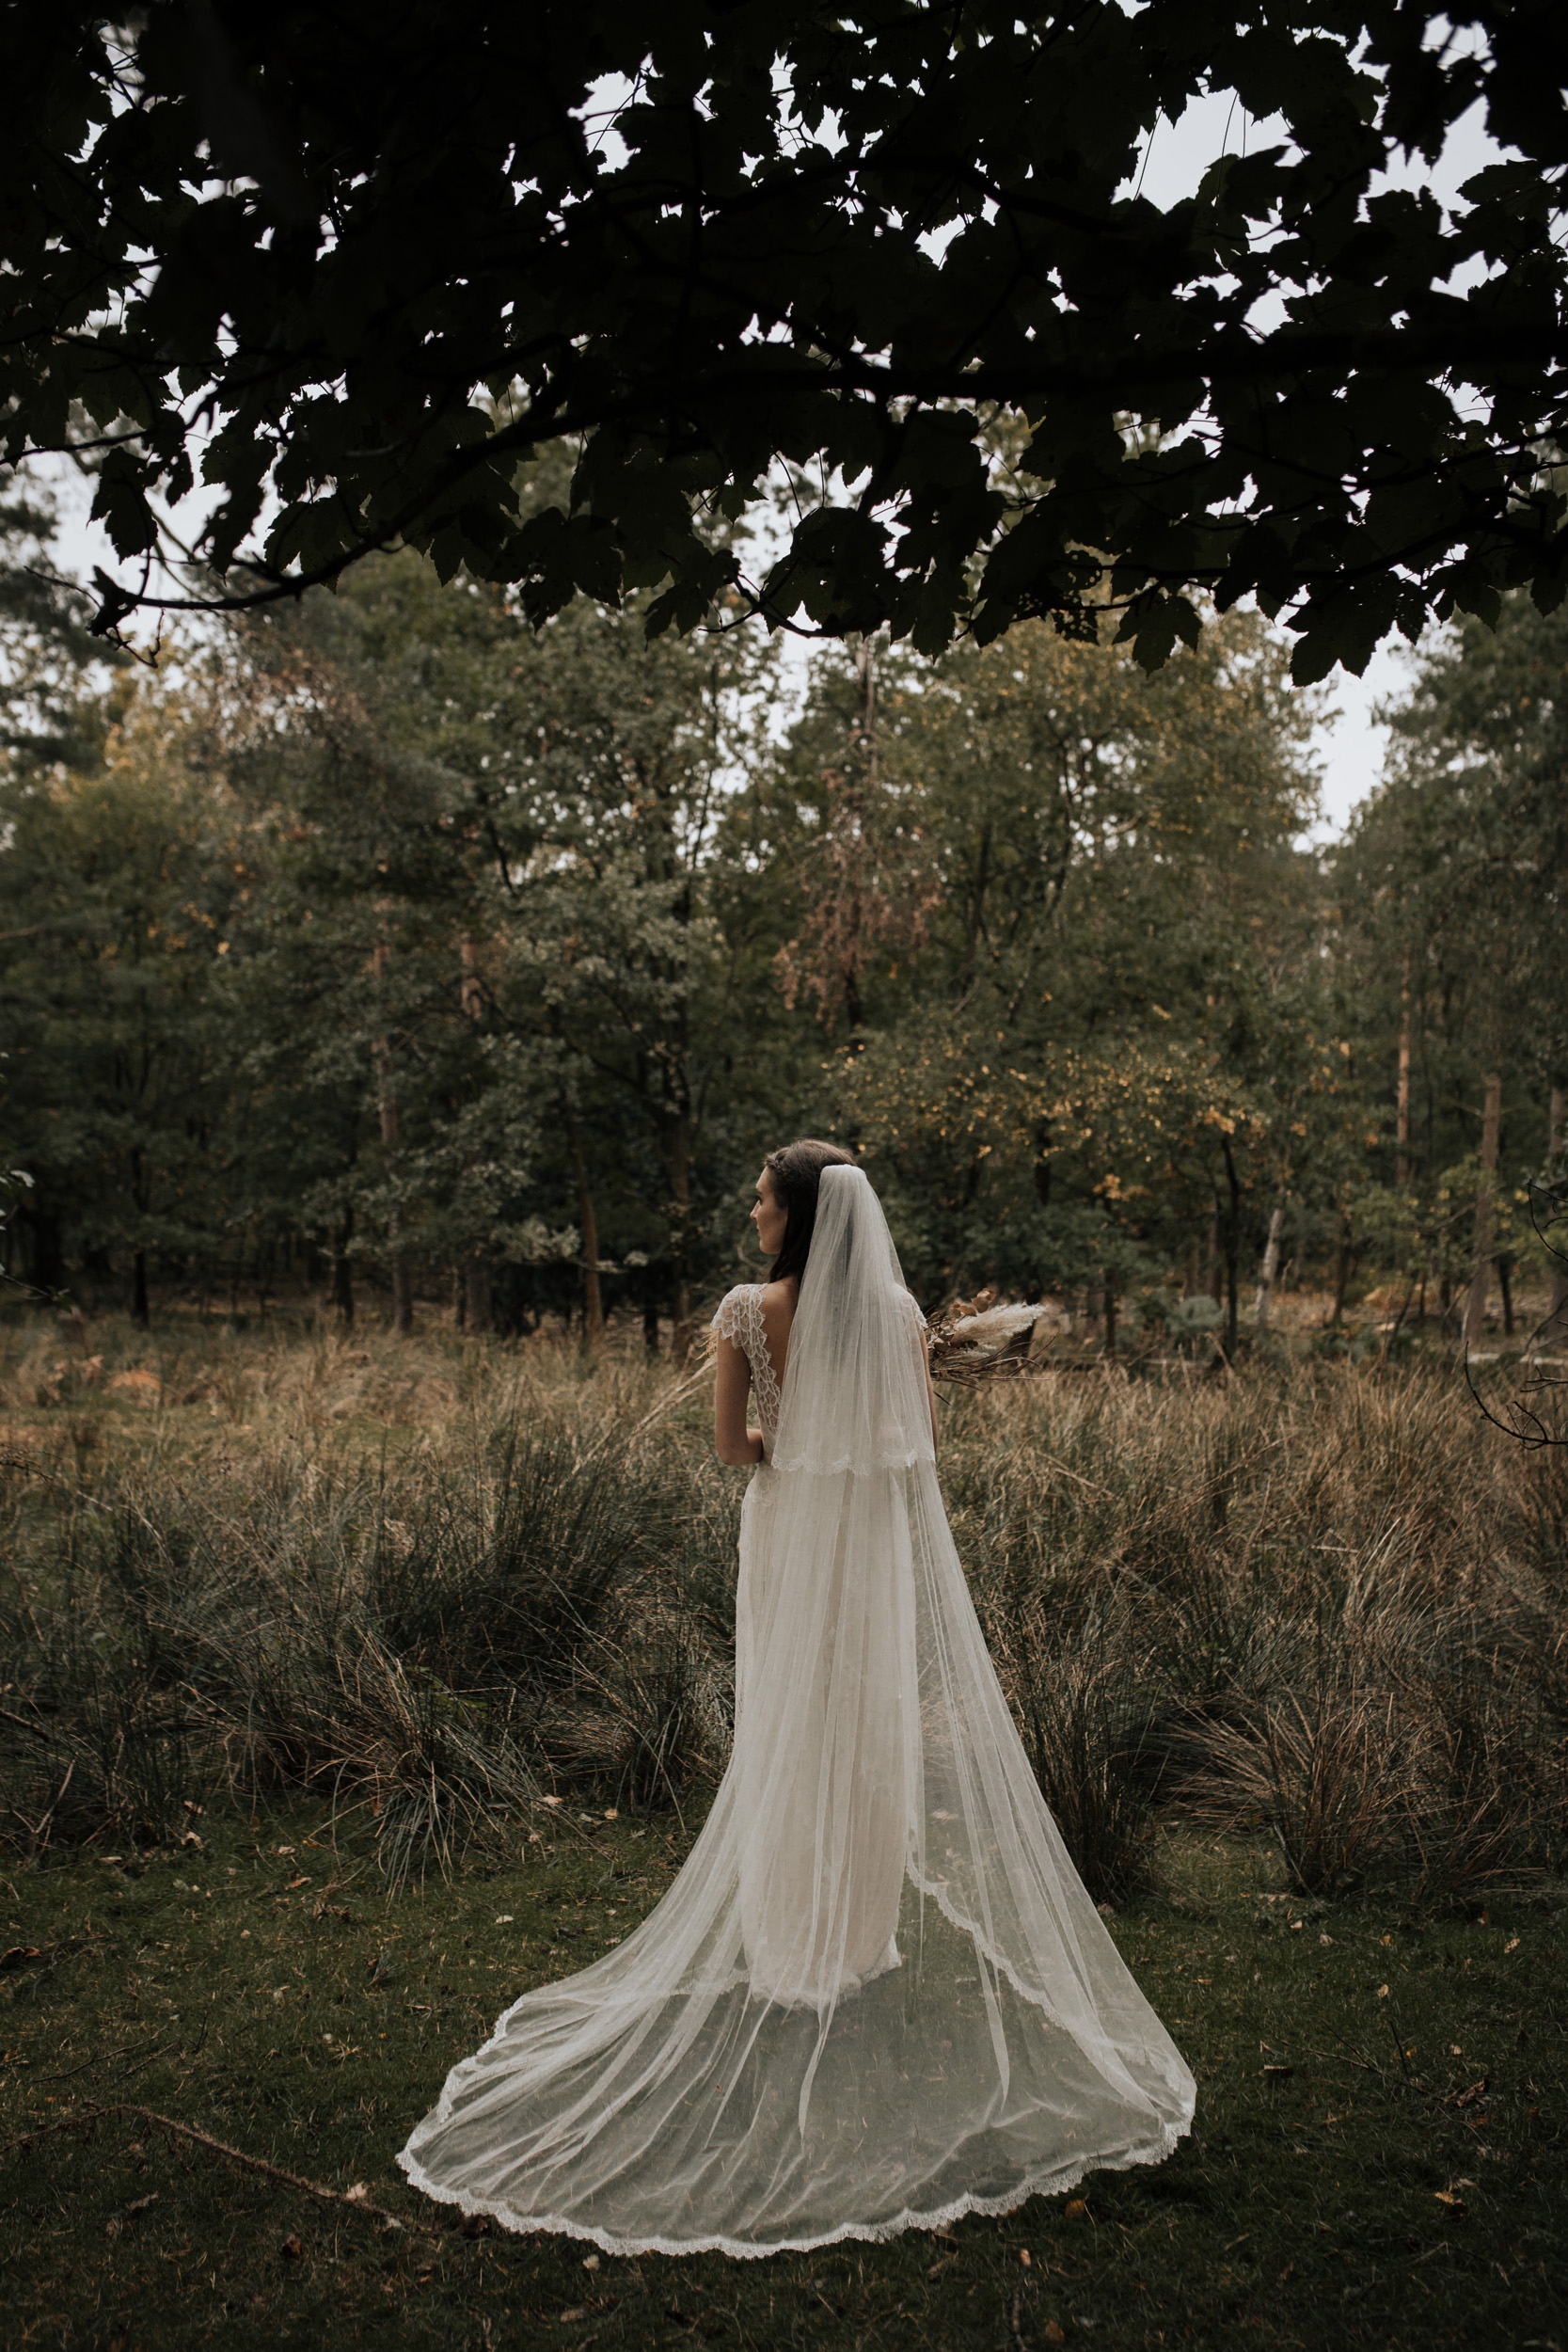 Joasia-Kate-Beaumont-Bohemian-Lace-Wedding-Dress-Peak-District-Sheffield-Wedding-40.jpg